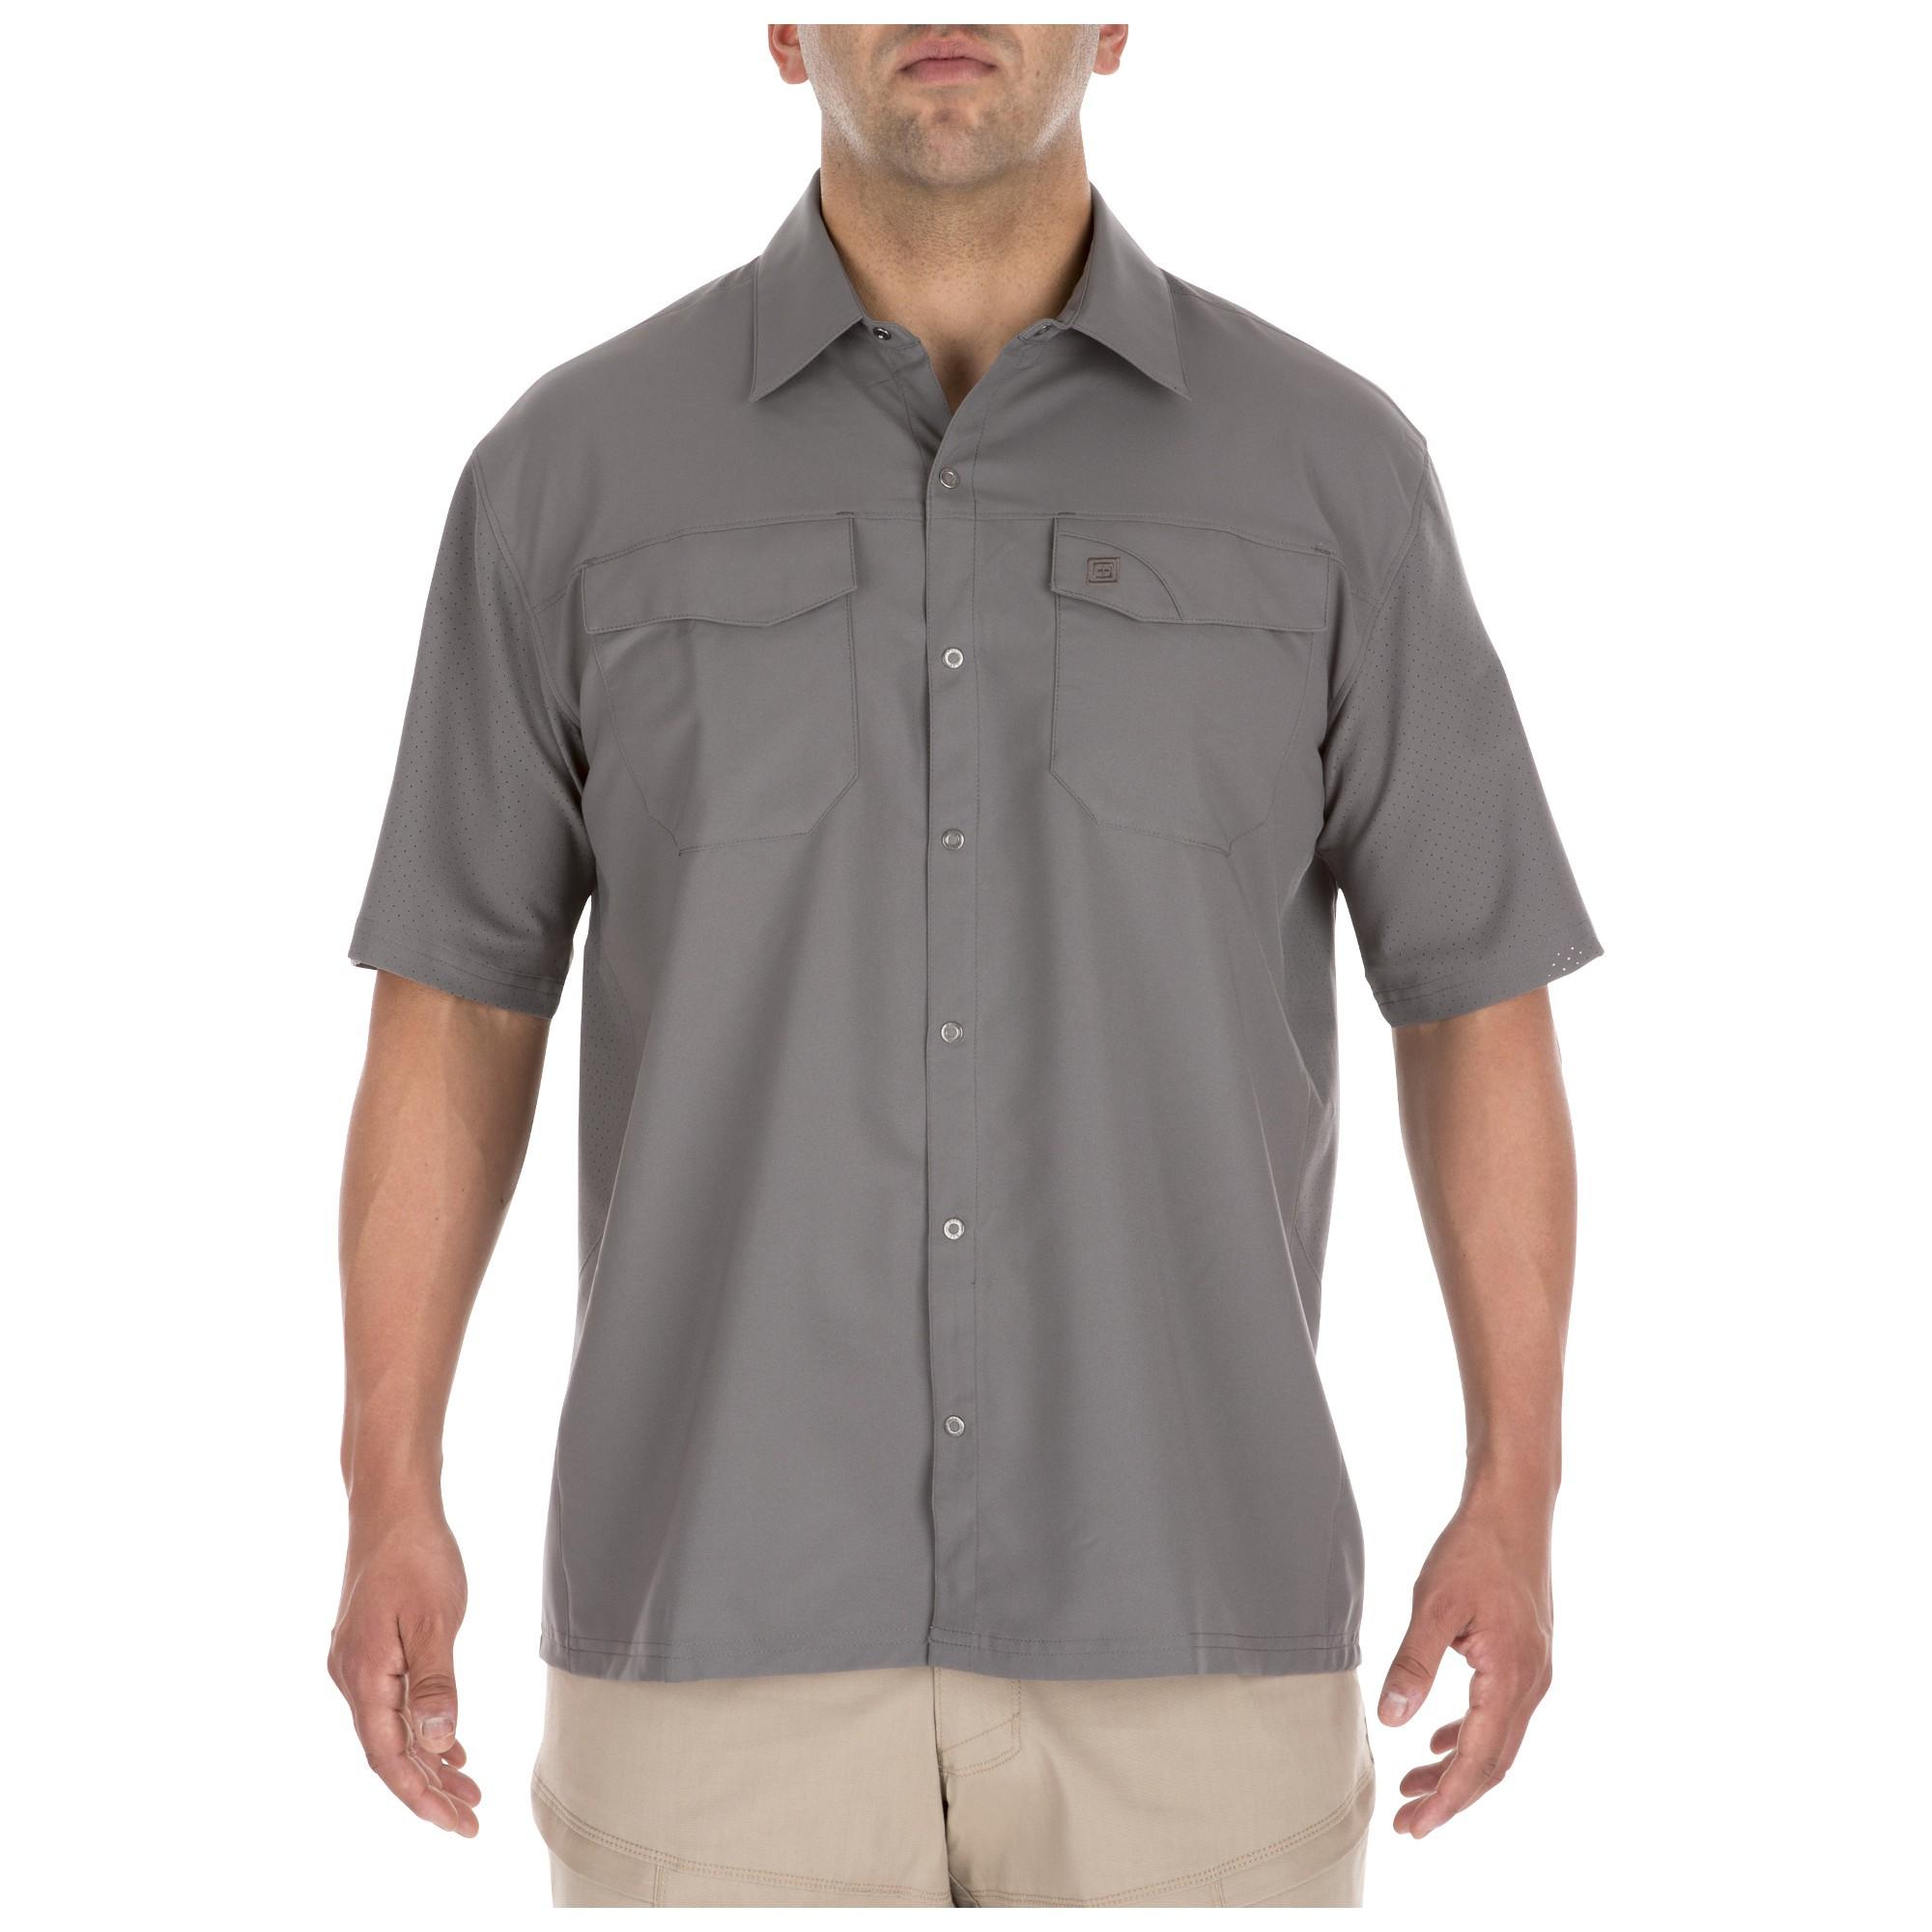 5.11 Freedom Flex Short-Sleeve Shirt 71340